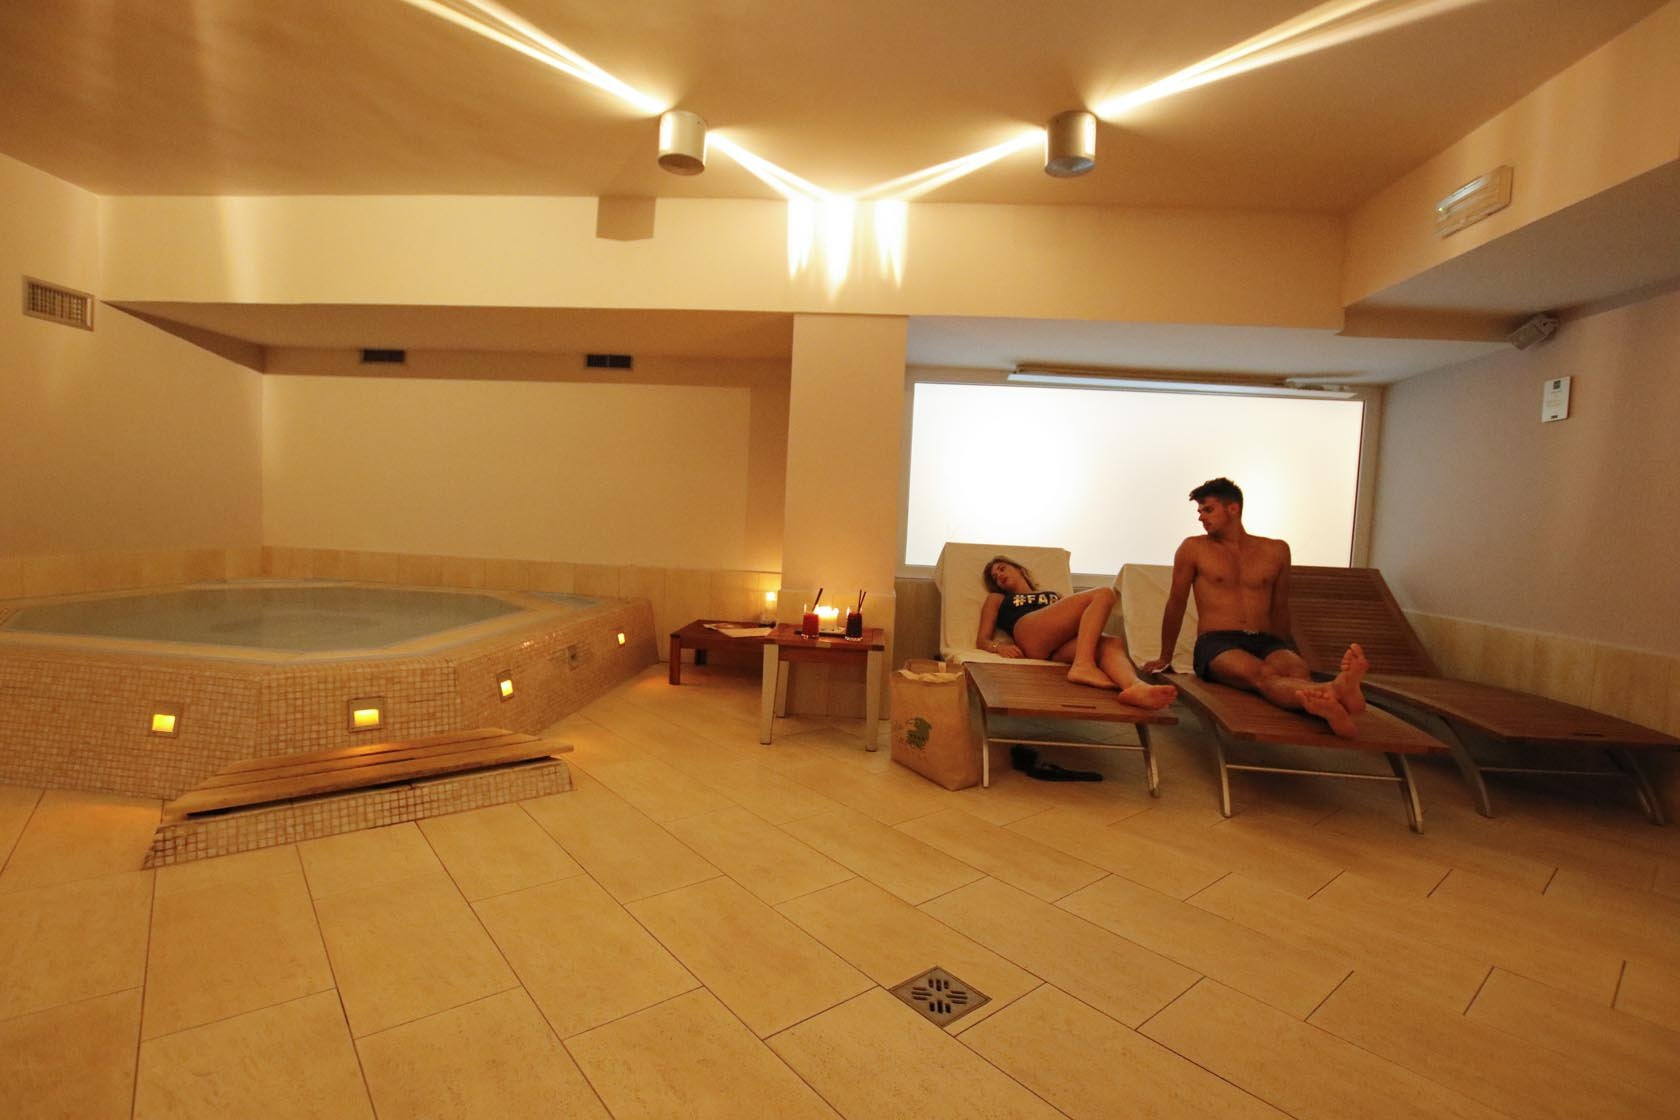 Grifone Hotel - Centro Wellness